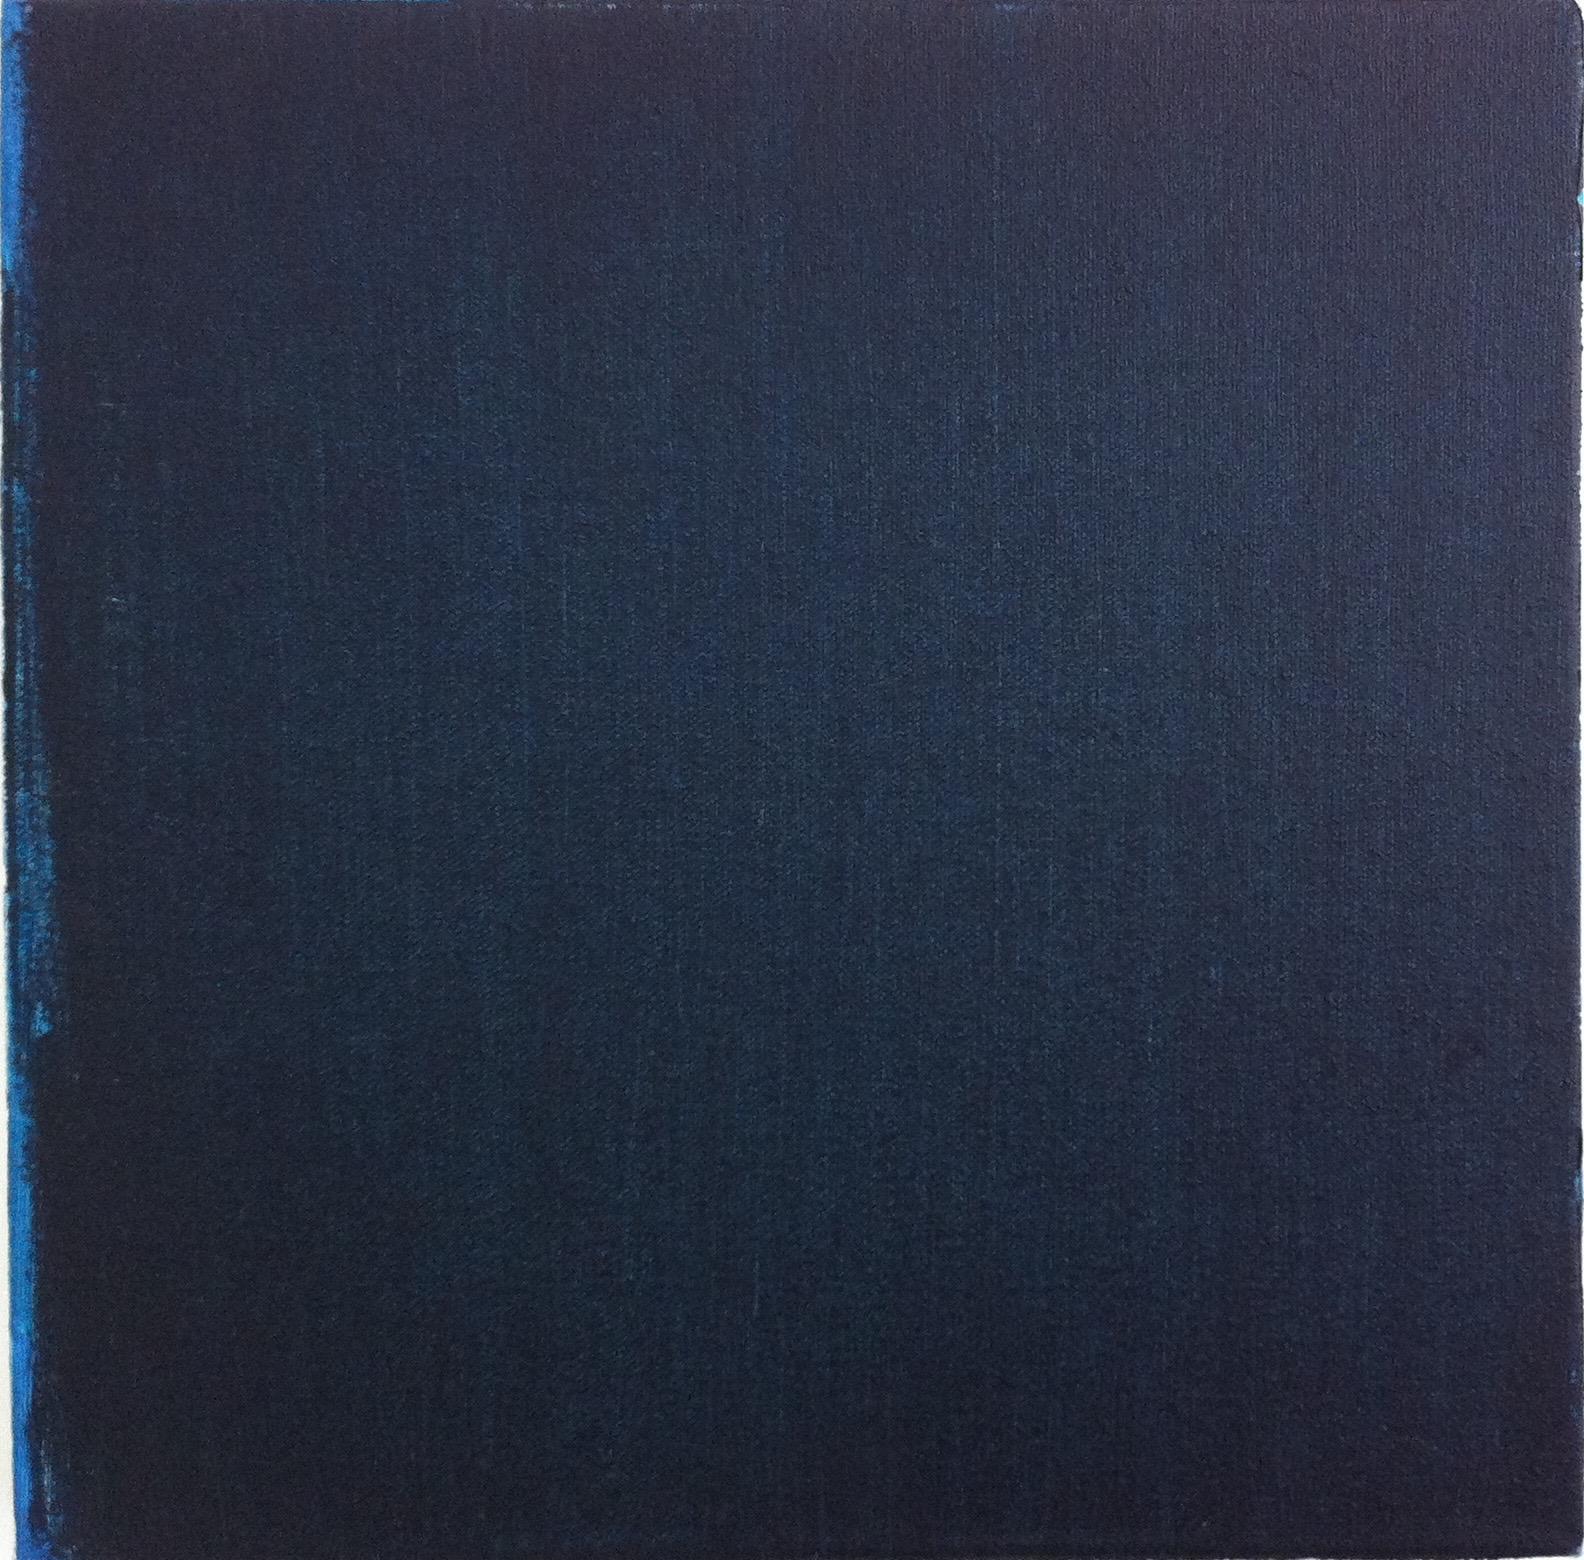 Mood Indigo, oil on canvas